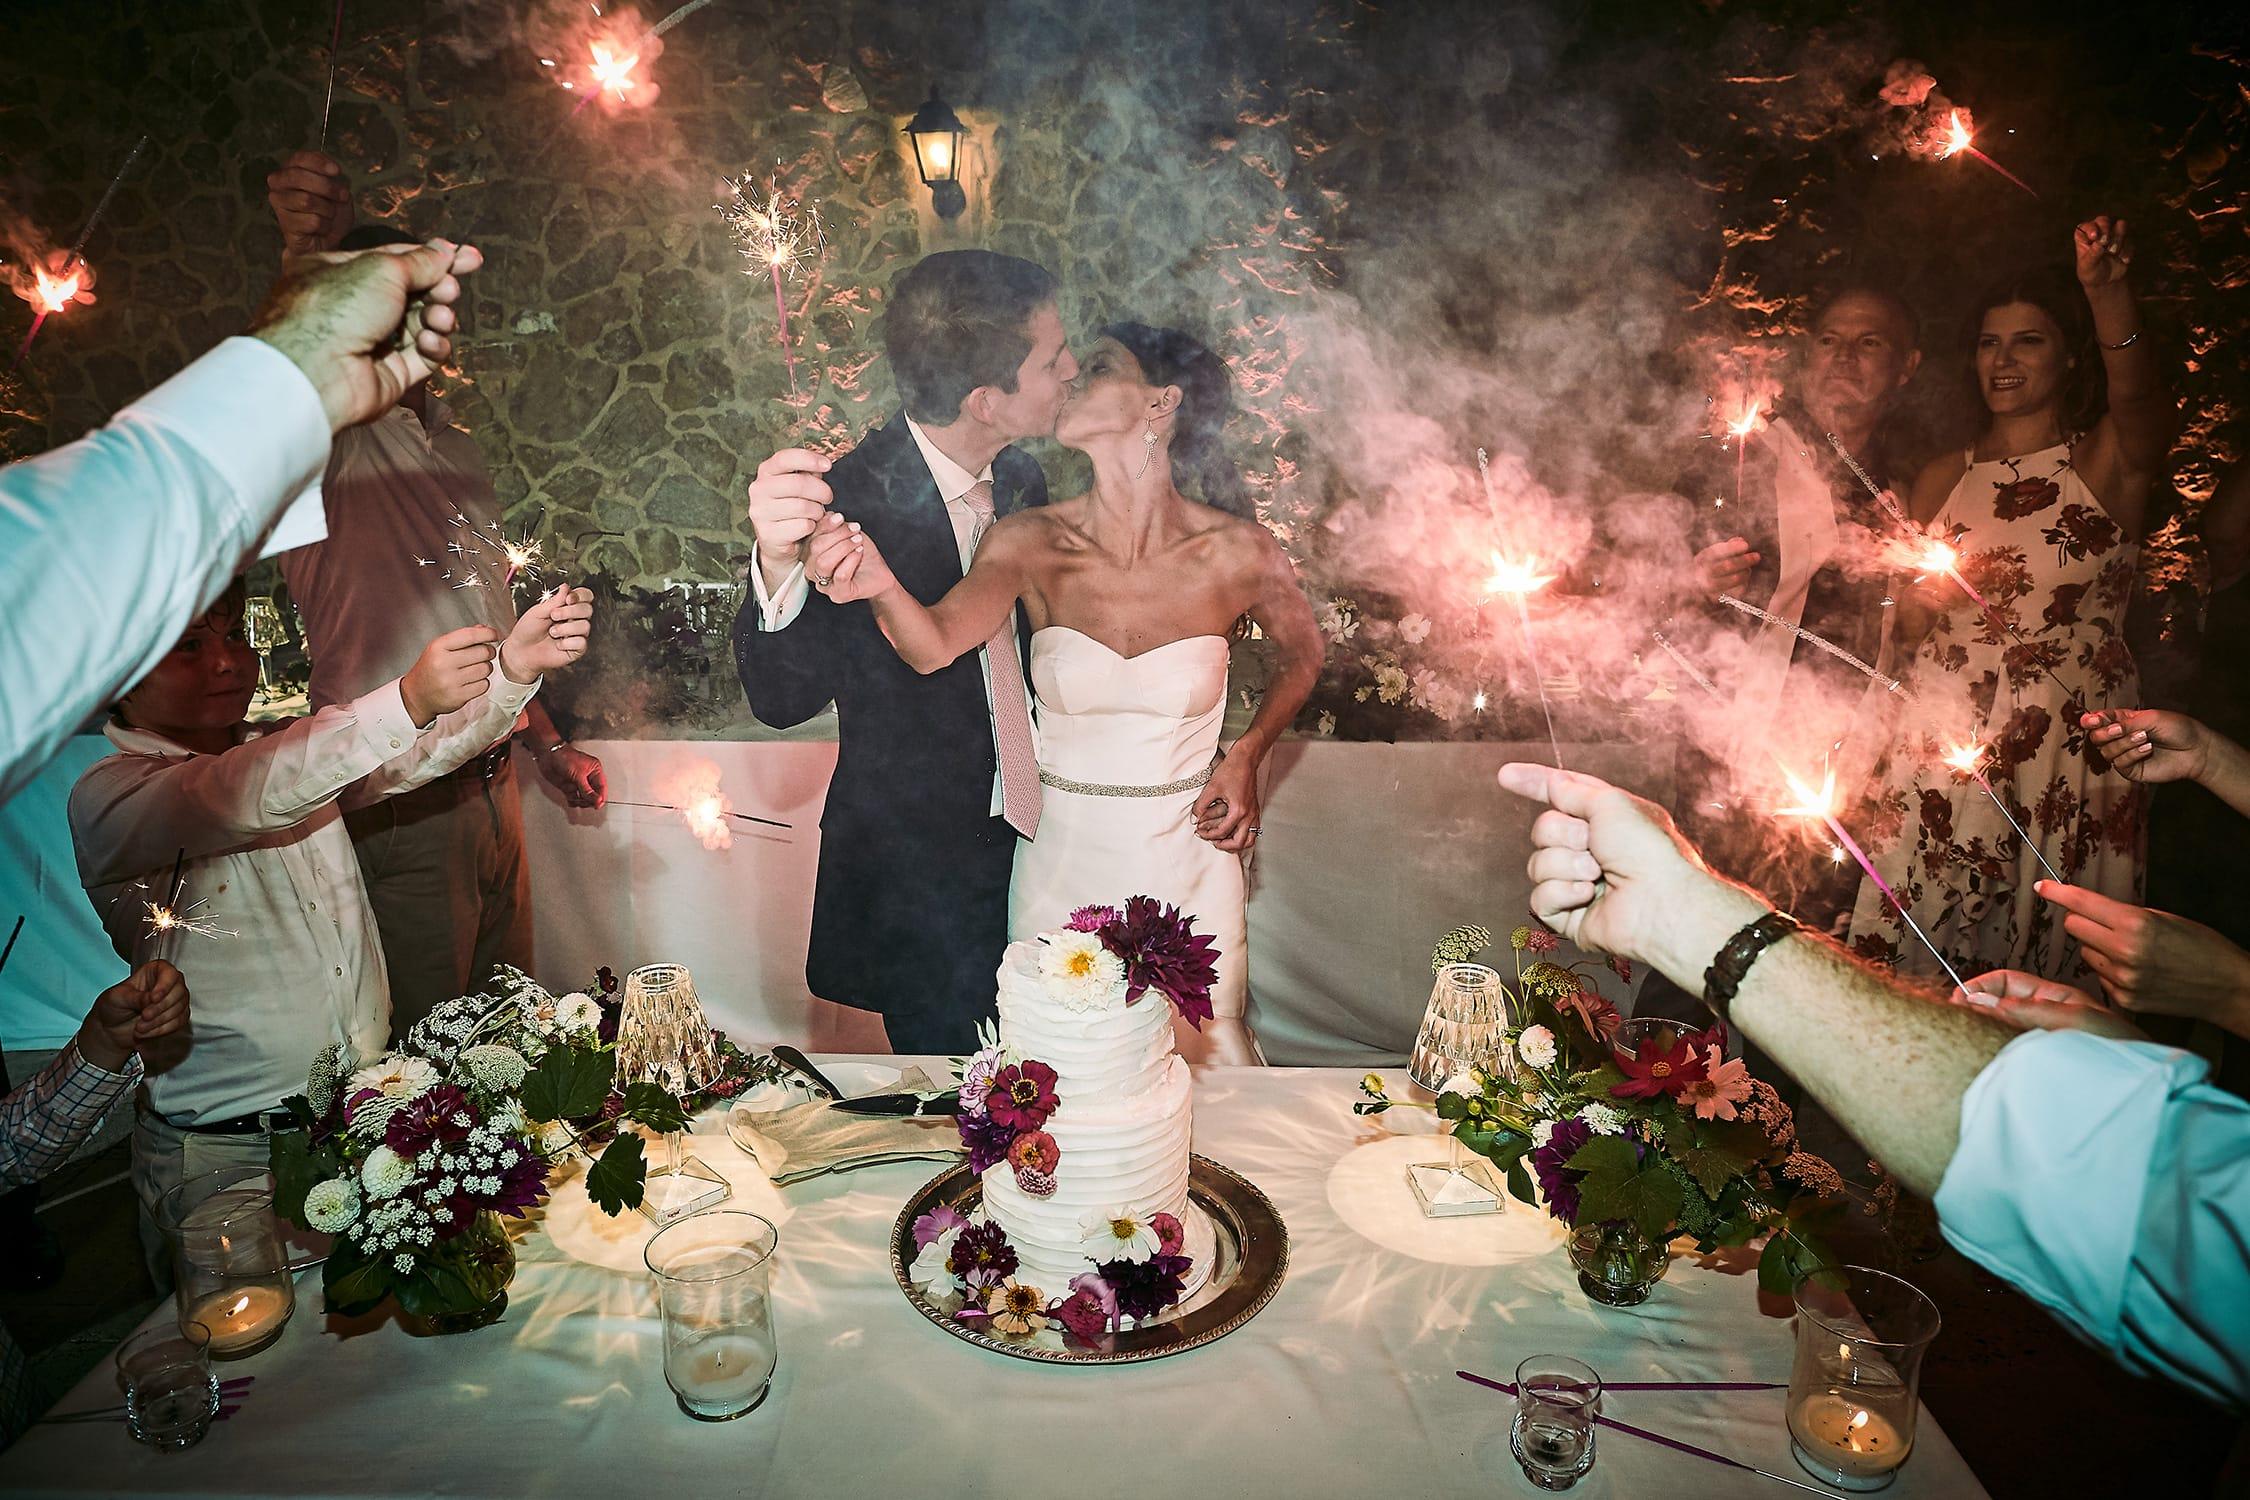 ristorante and catering and matrimonio and classe and verona